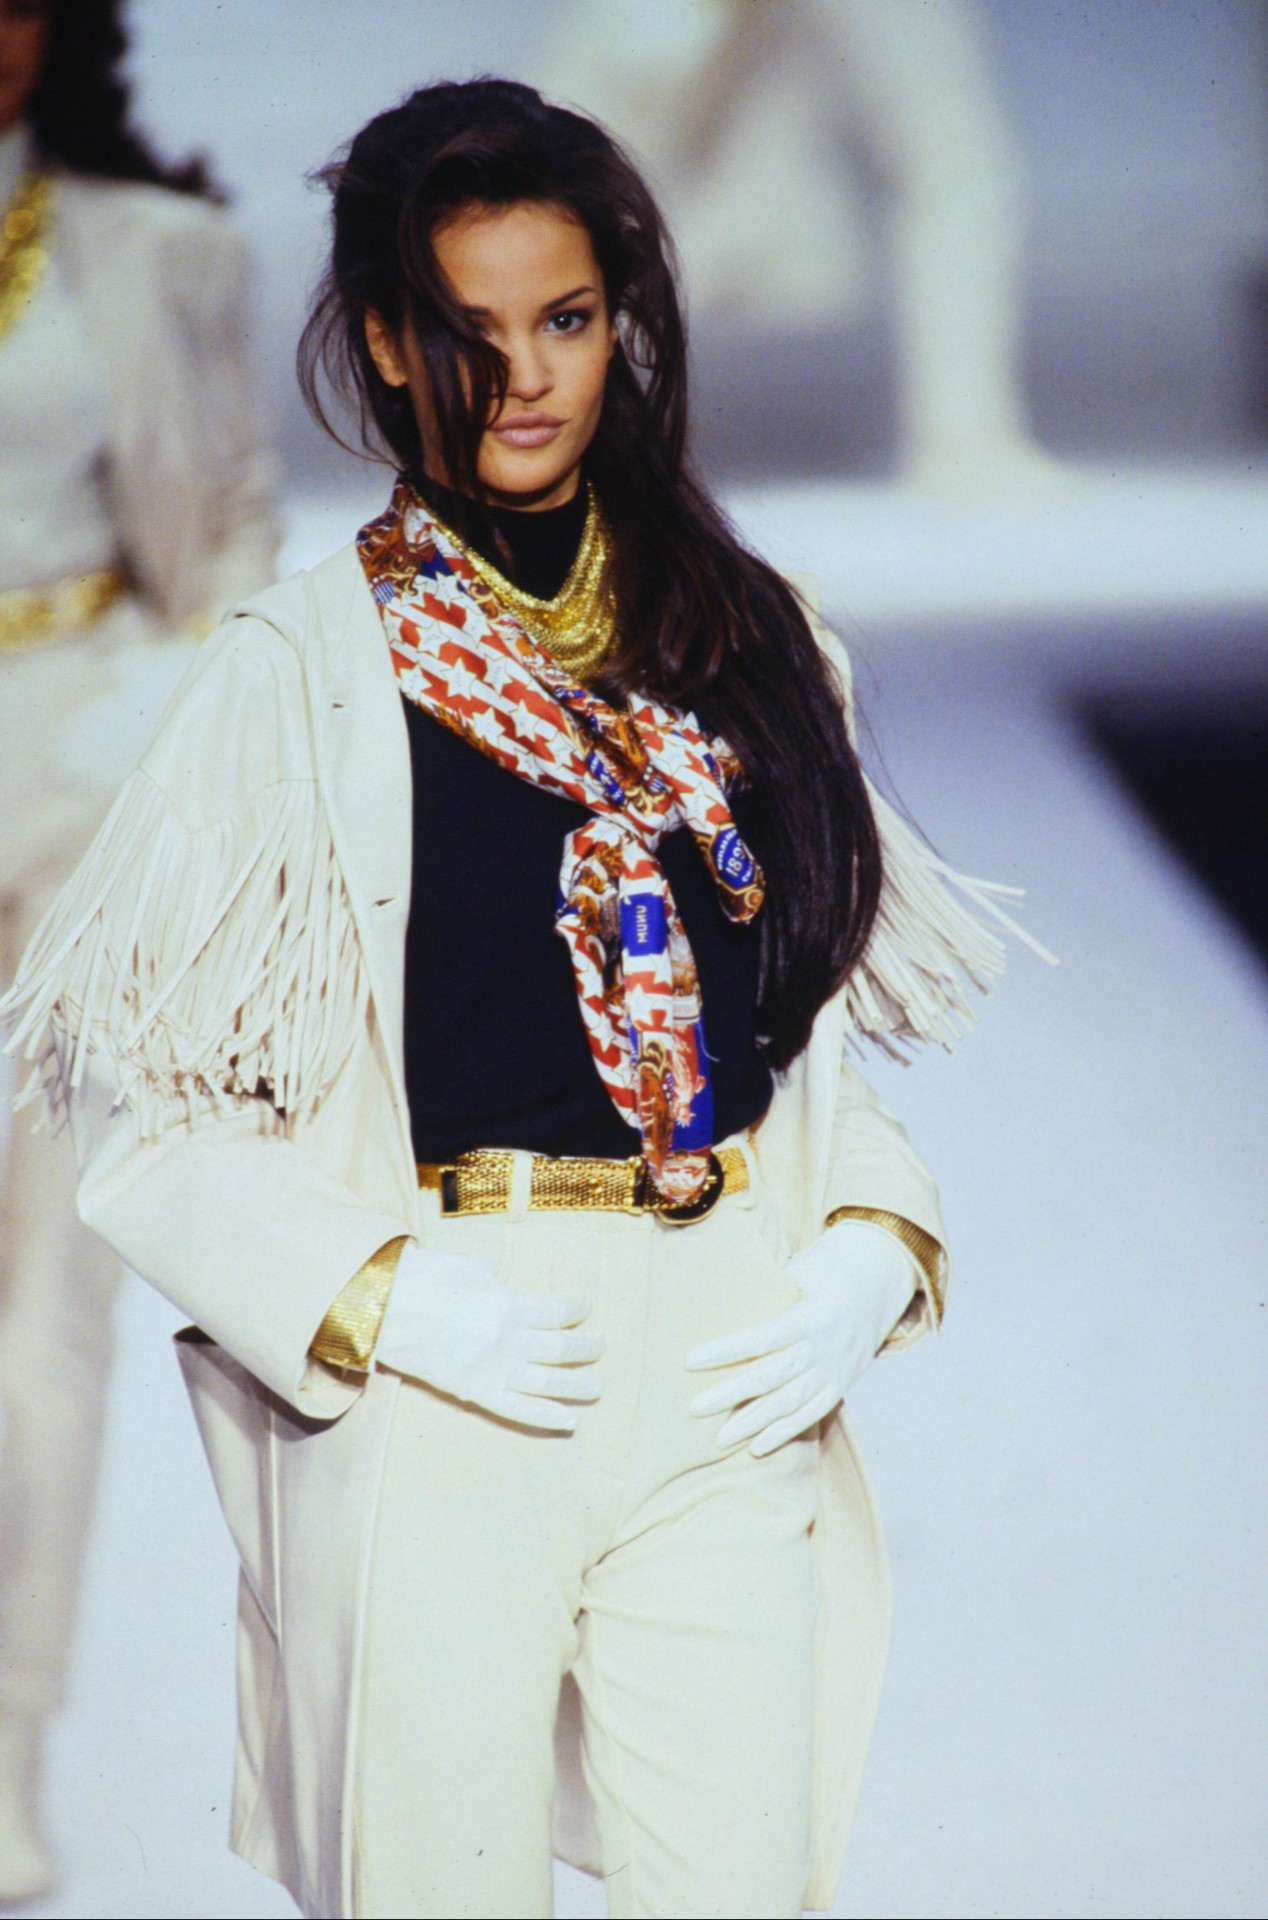 Alberta Ferretti - Fall 1992 RTW #fashion#fashion show#alberta ferretti #fall 1992 rtw #1992#affall1992rtw#claudia mason#supermodel#original supermodels#supermodels#90s#90s fashion#runway#runway show#model#models#haute couture#couture#glamour#luxury#designer